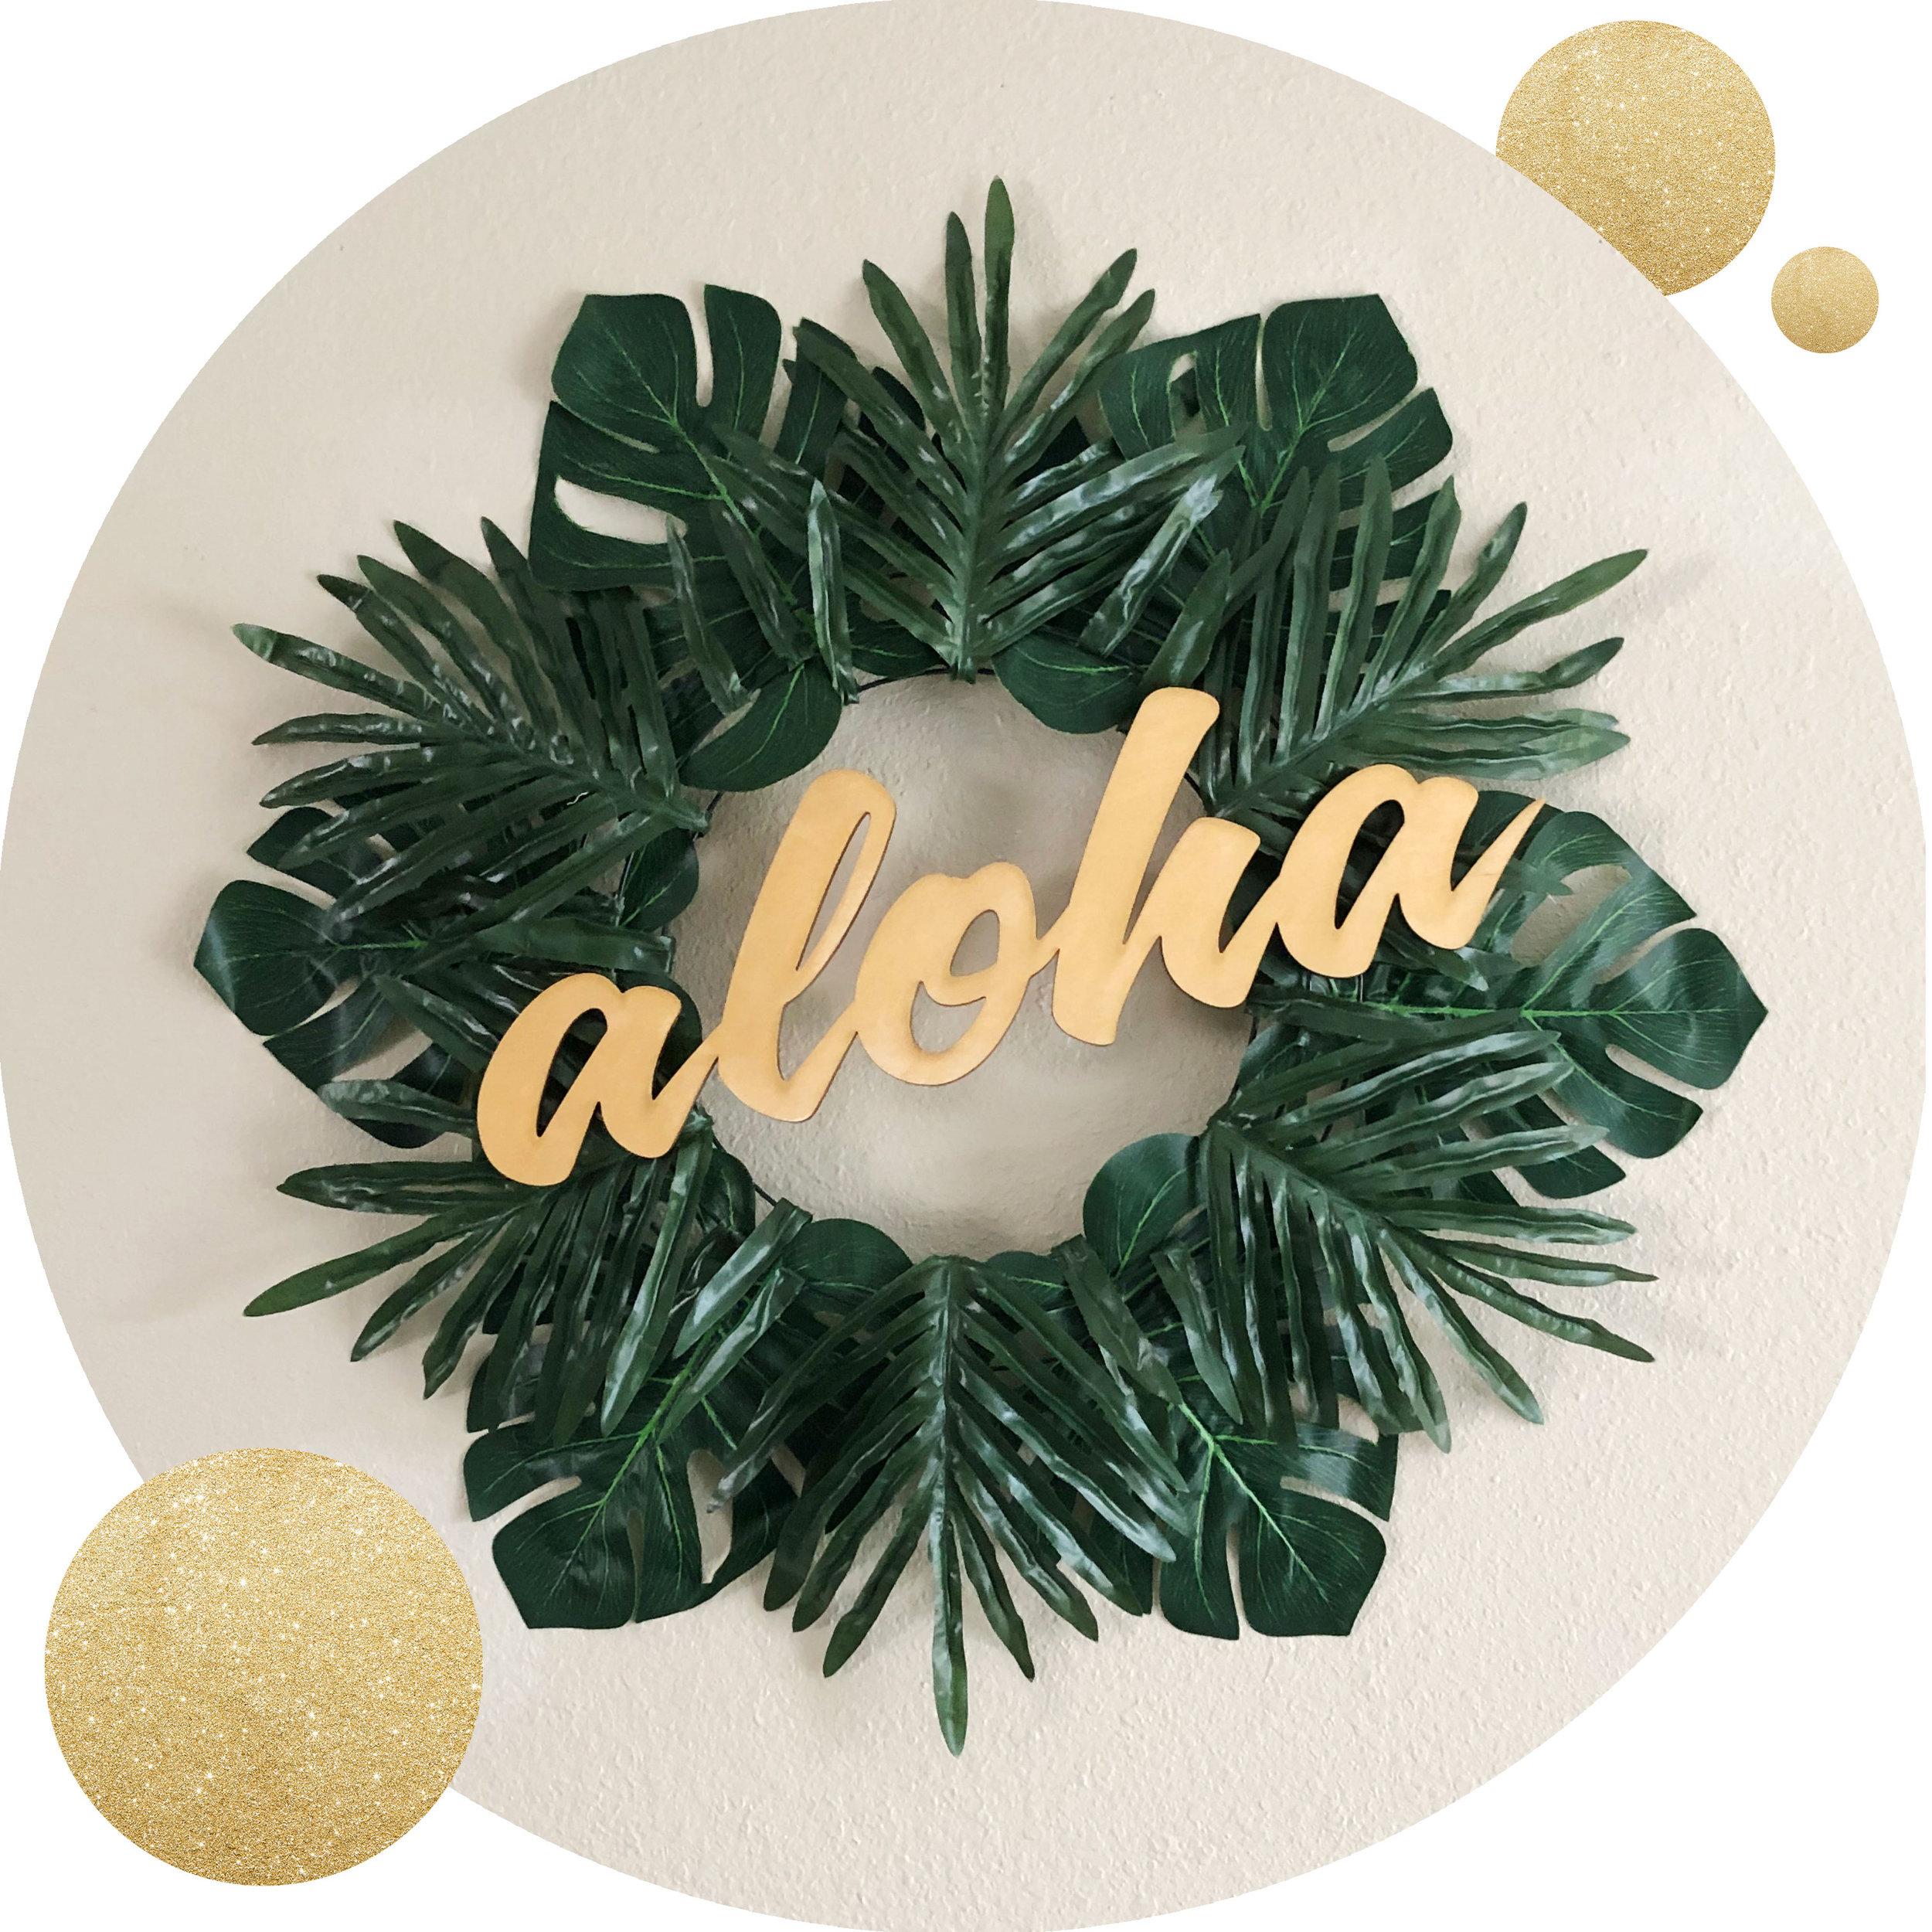 AlohaWreath_Hero.jpg